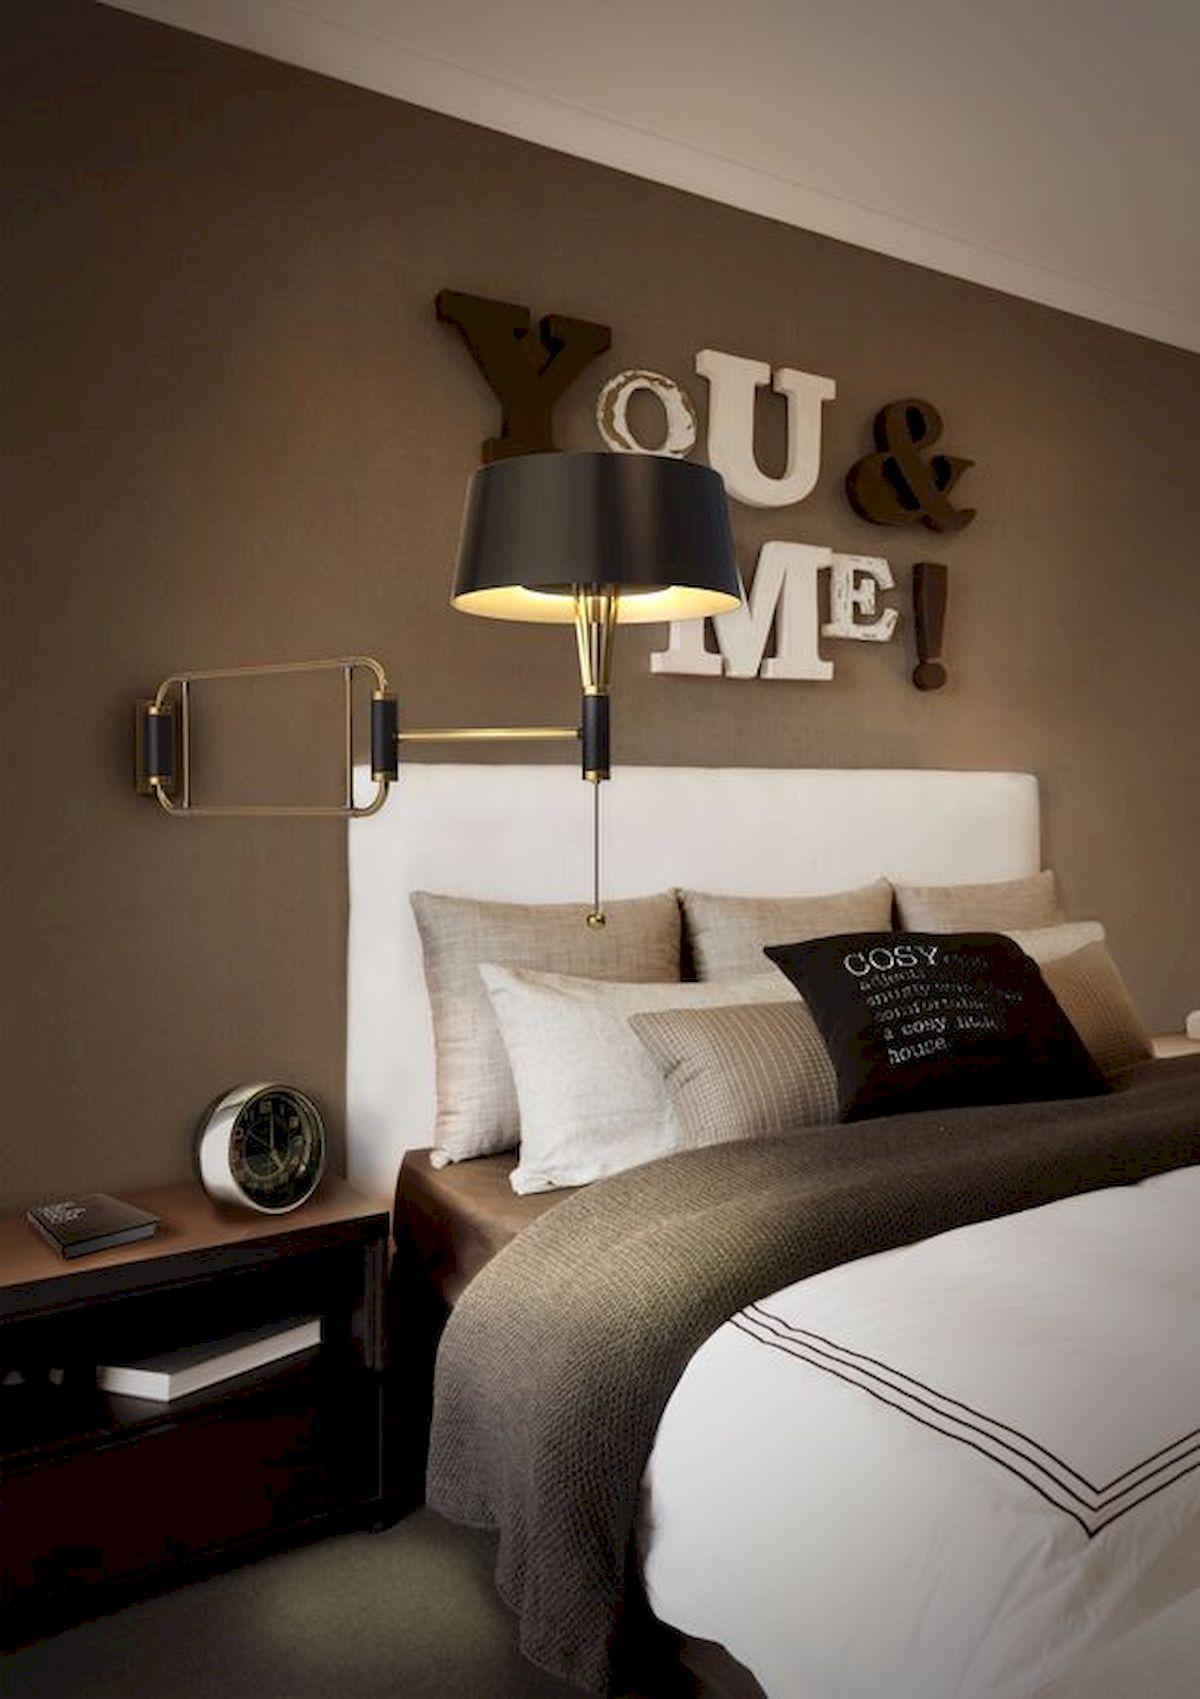 55 Romantic DIY Bedroom Decor for Couple (7)